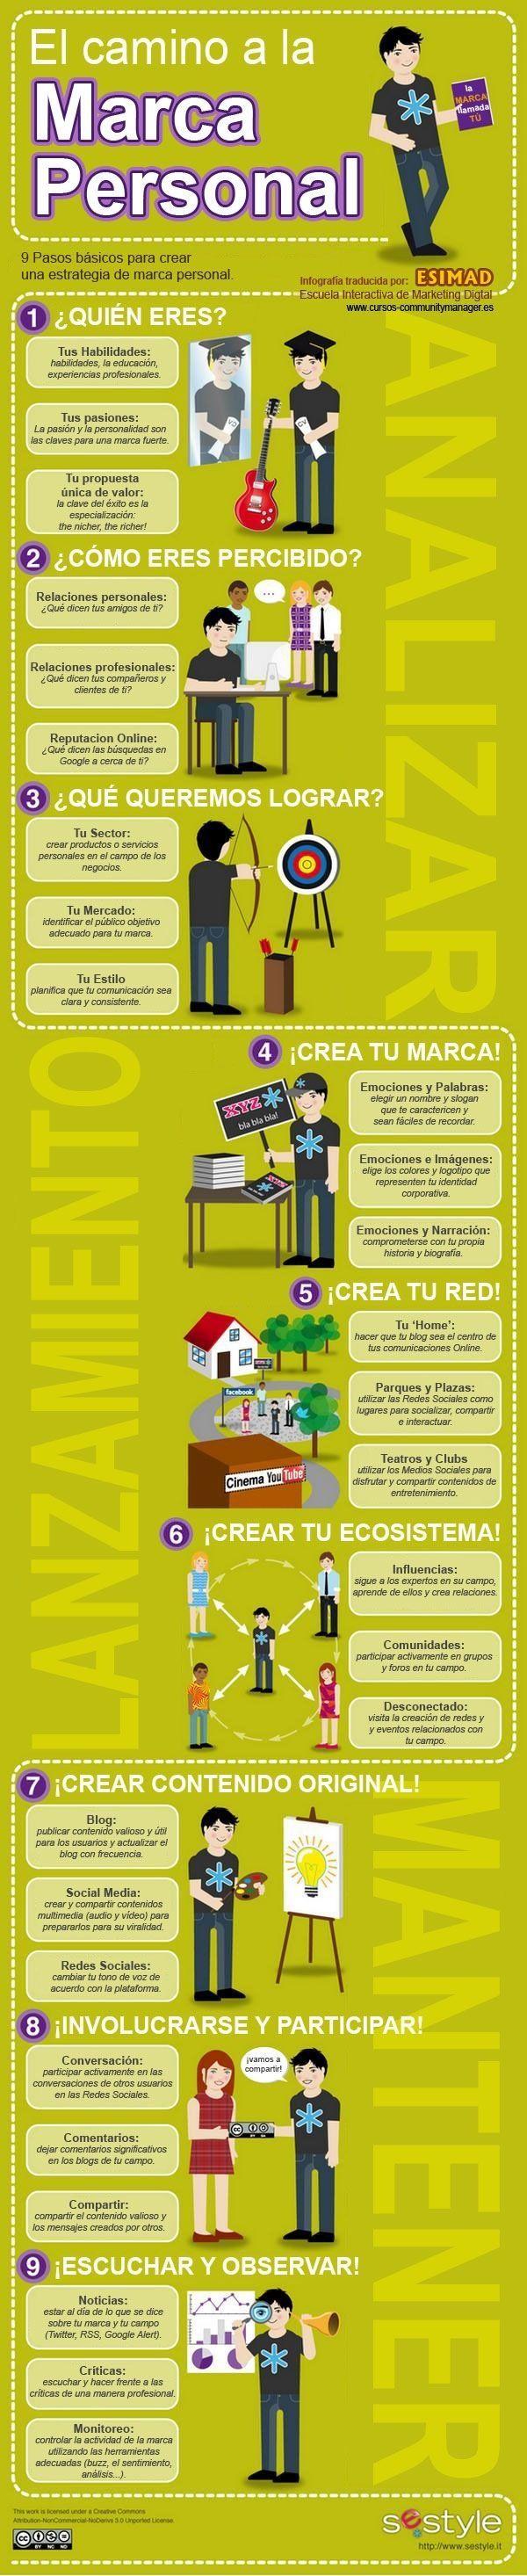 9 pasos para crear tu Marca Personal #infografia #infographic #marketing